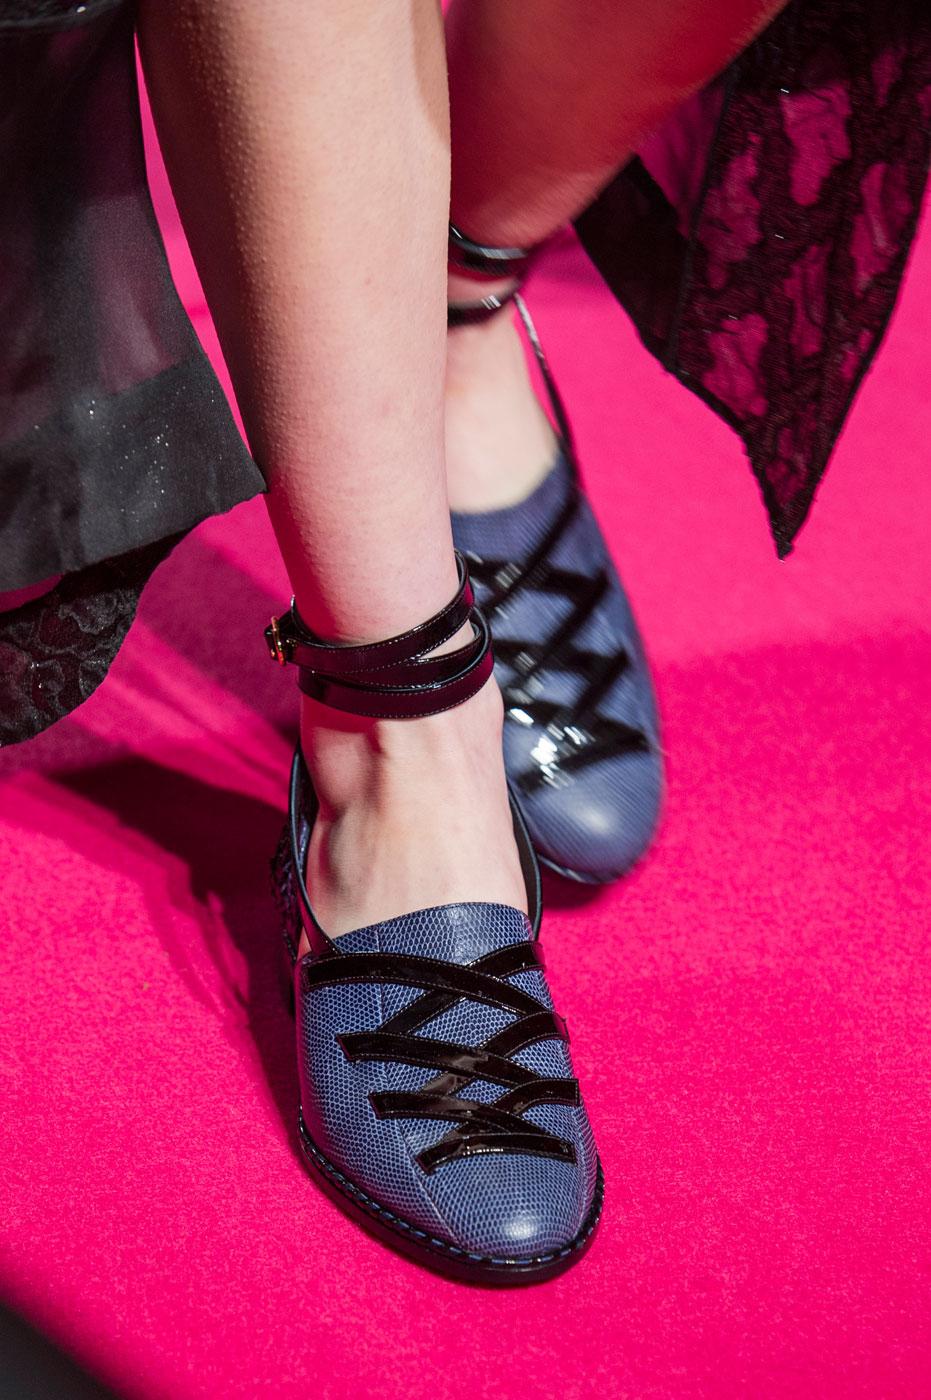 Schiaparelli-fashion-runway-show-close-ups-haute-couture-paris-spring-summer-2015-the-impression-54